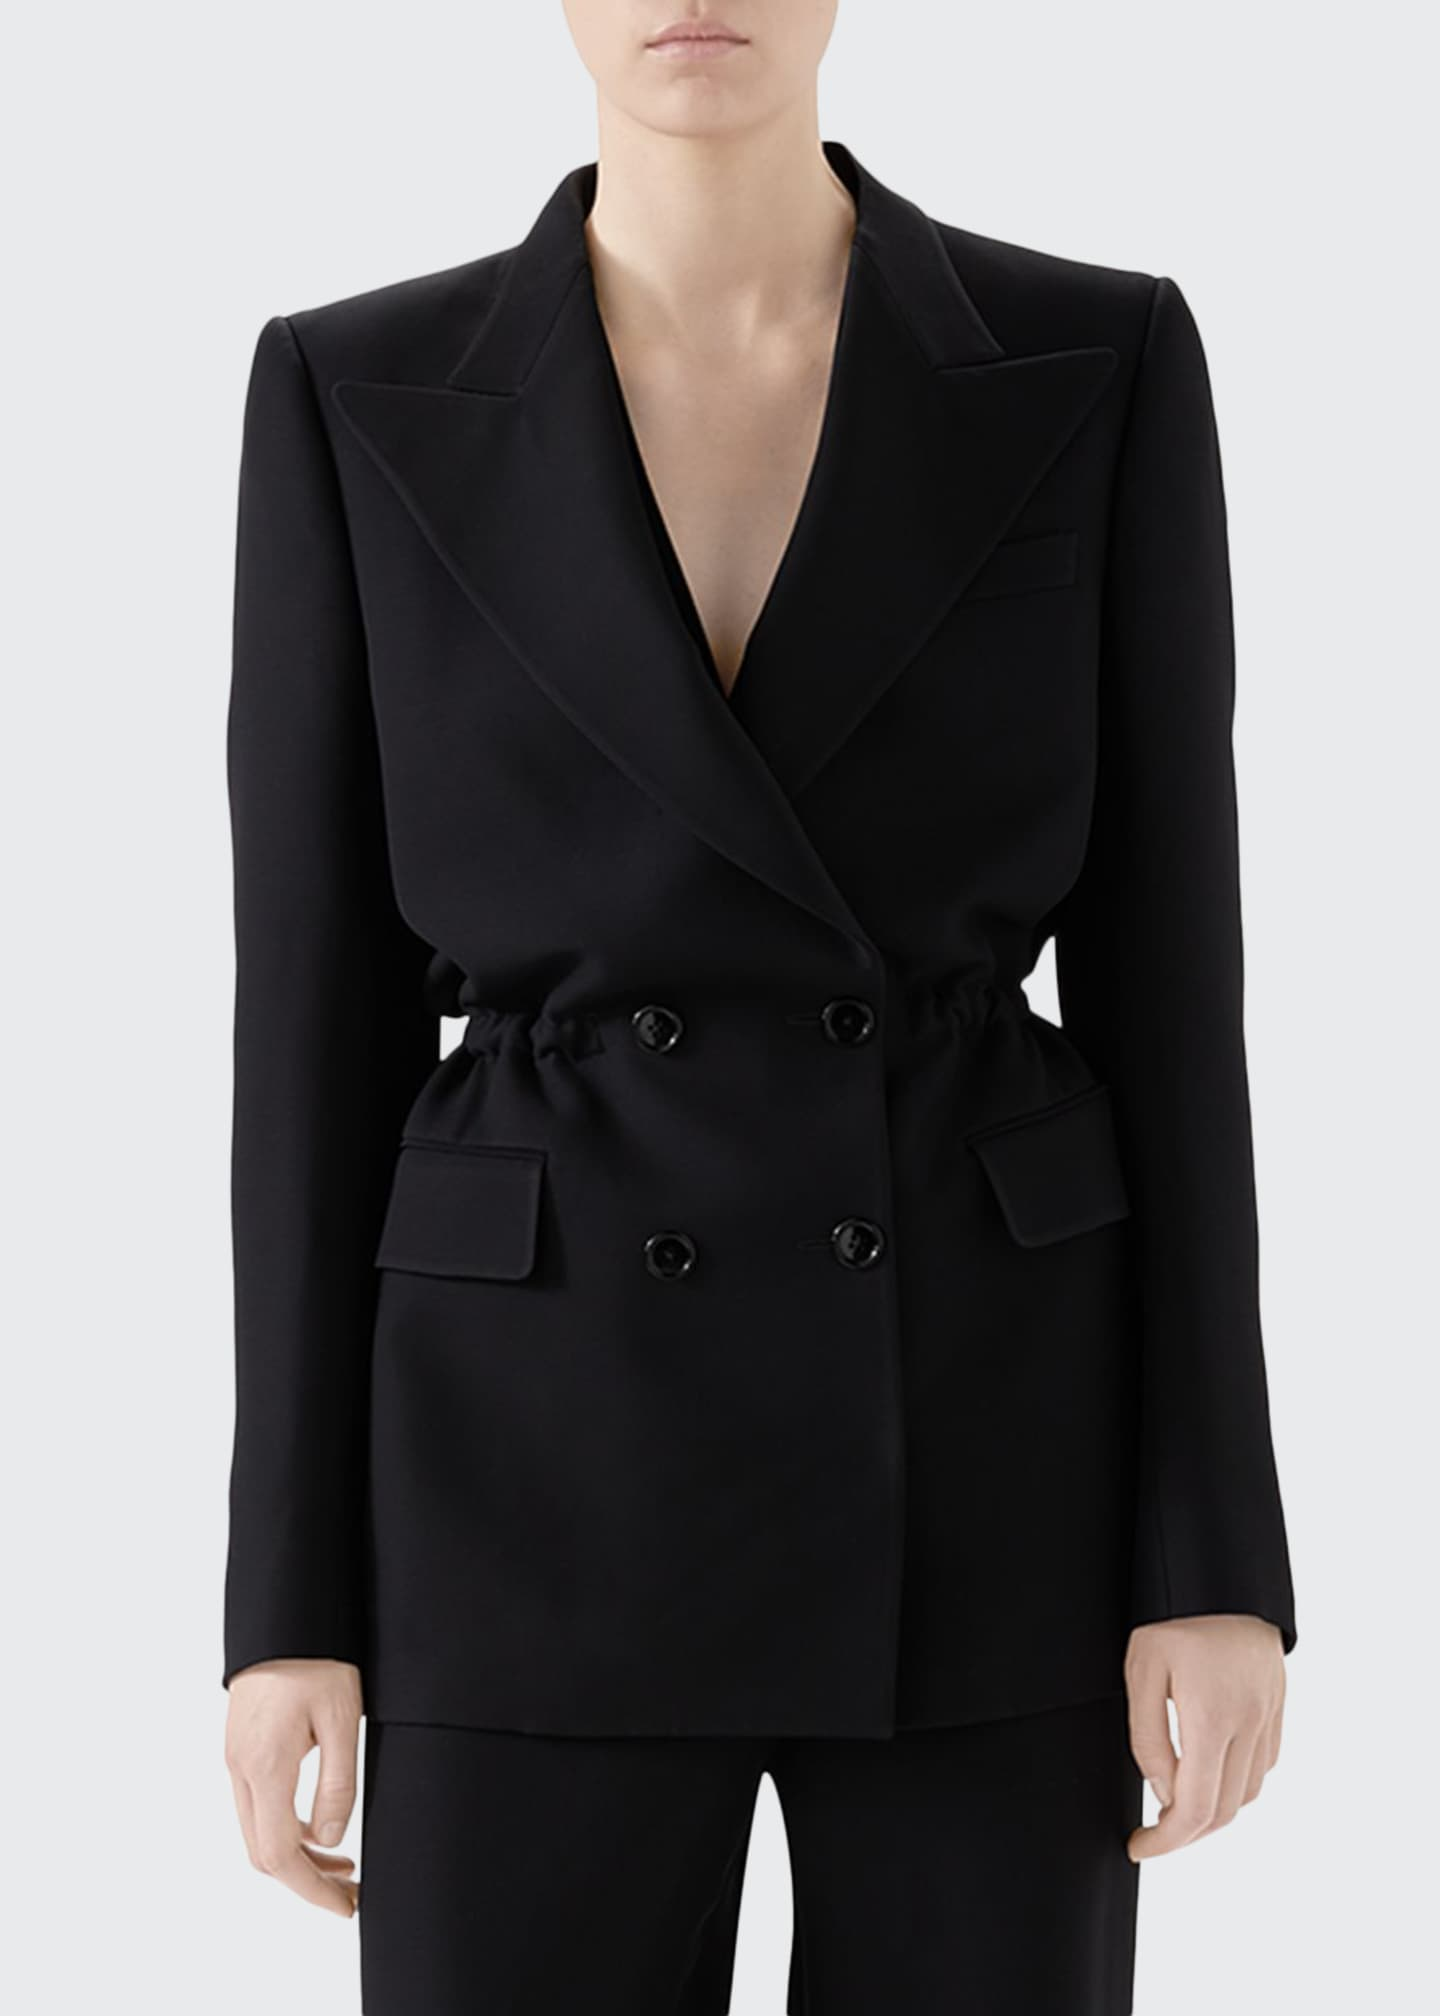 Gucci Cady Crepe Jacket